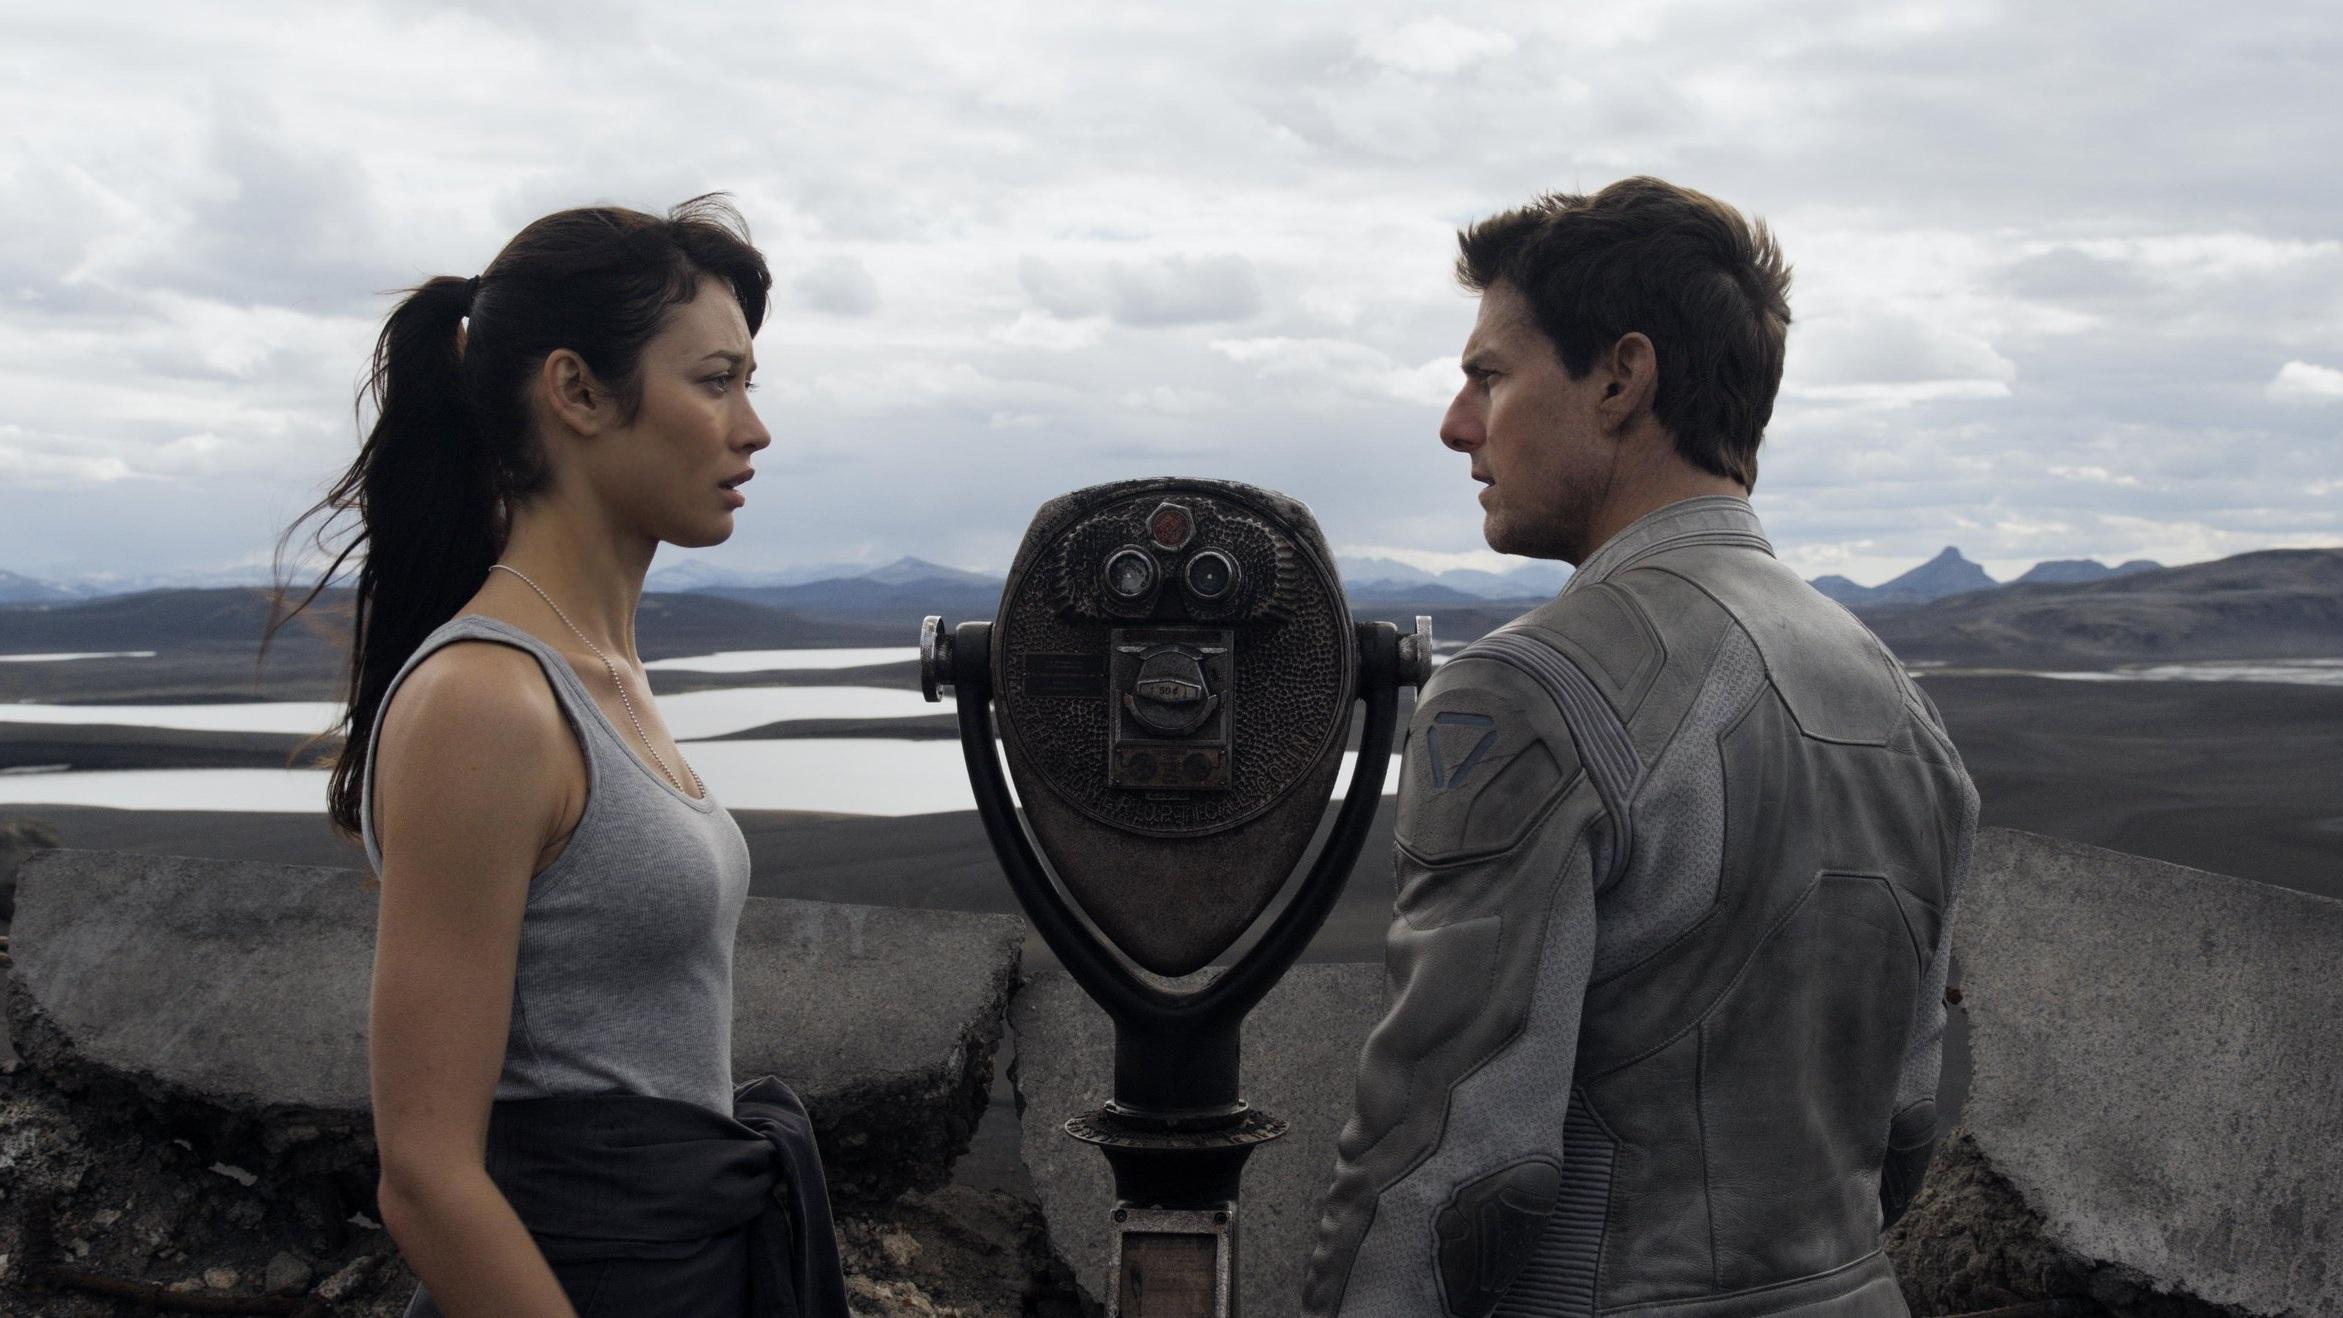 #99) Oblivion - (2013 - dir. Joseph Kosinski)